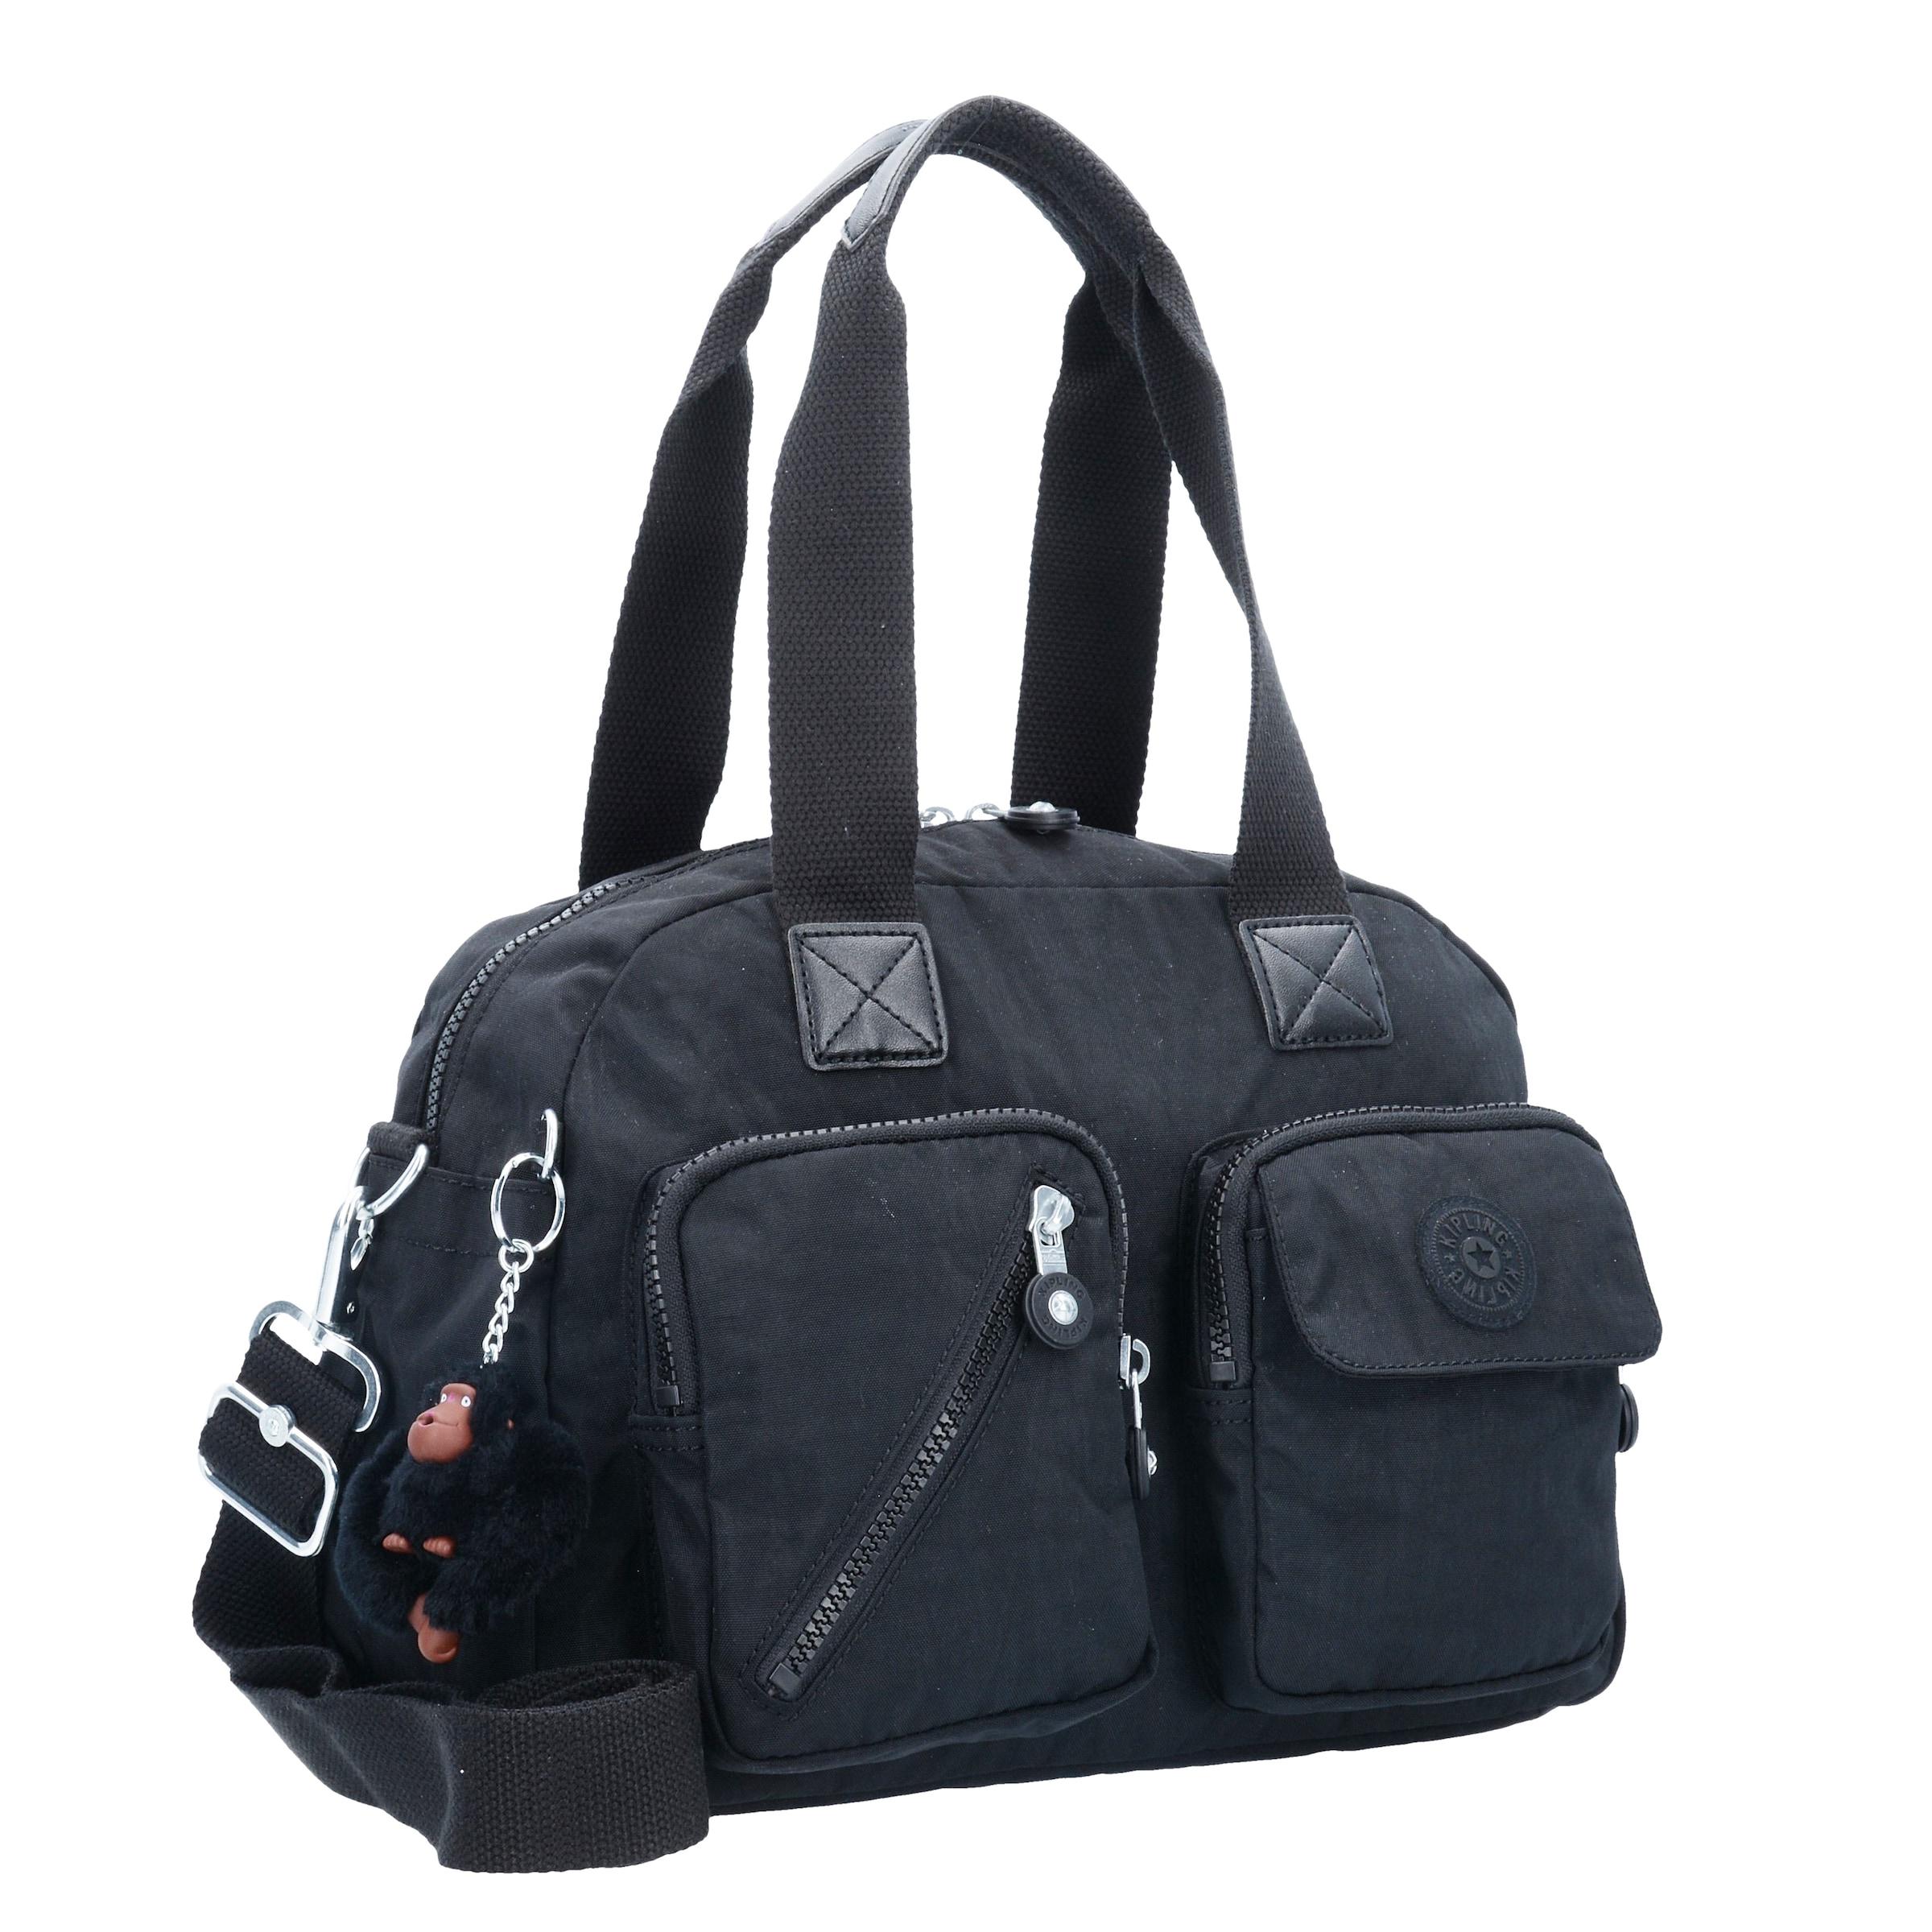 Up' Kobaltblau 'basic Kipling Tasche In Defea bf67vYgy